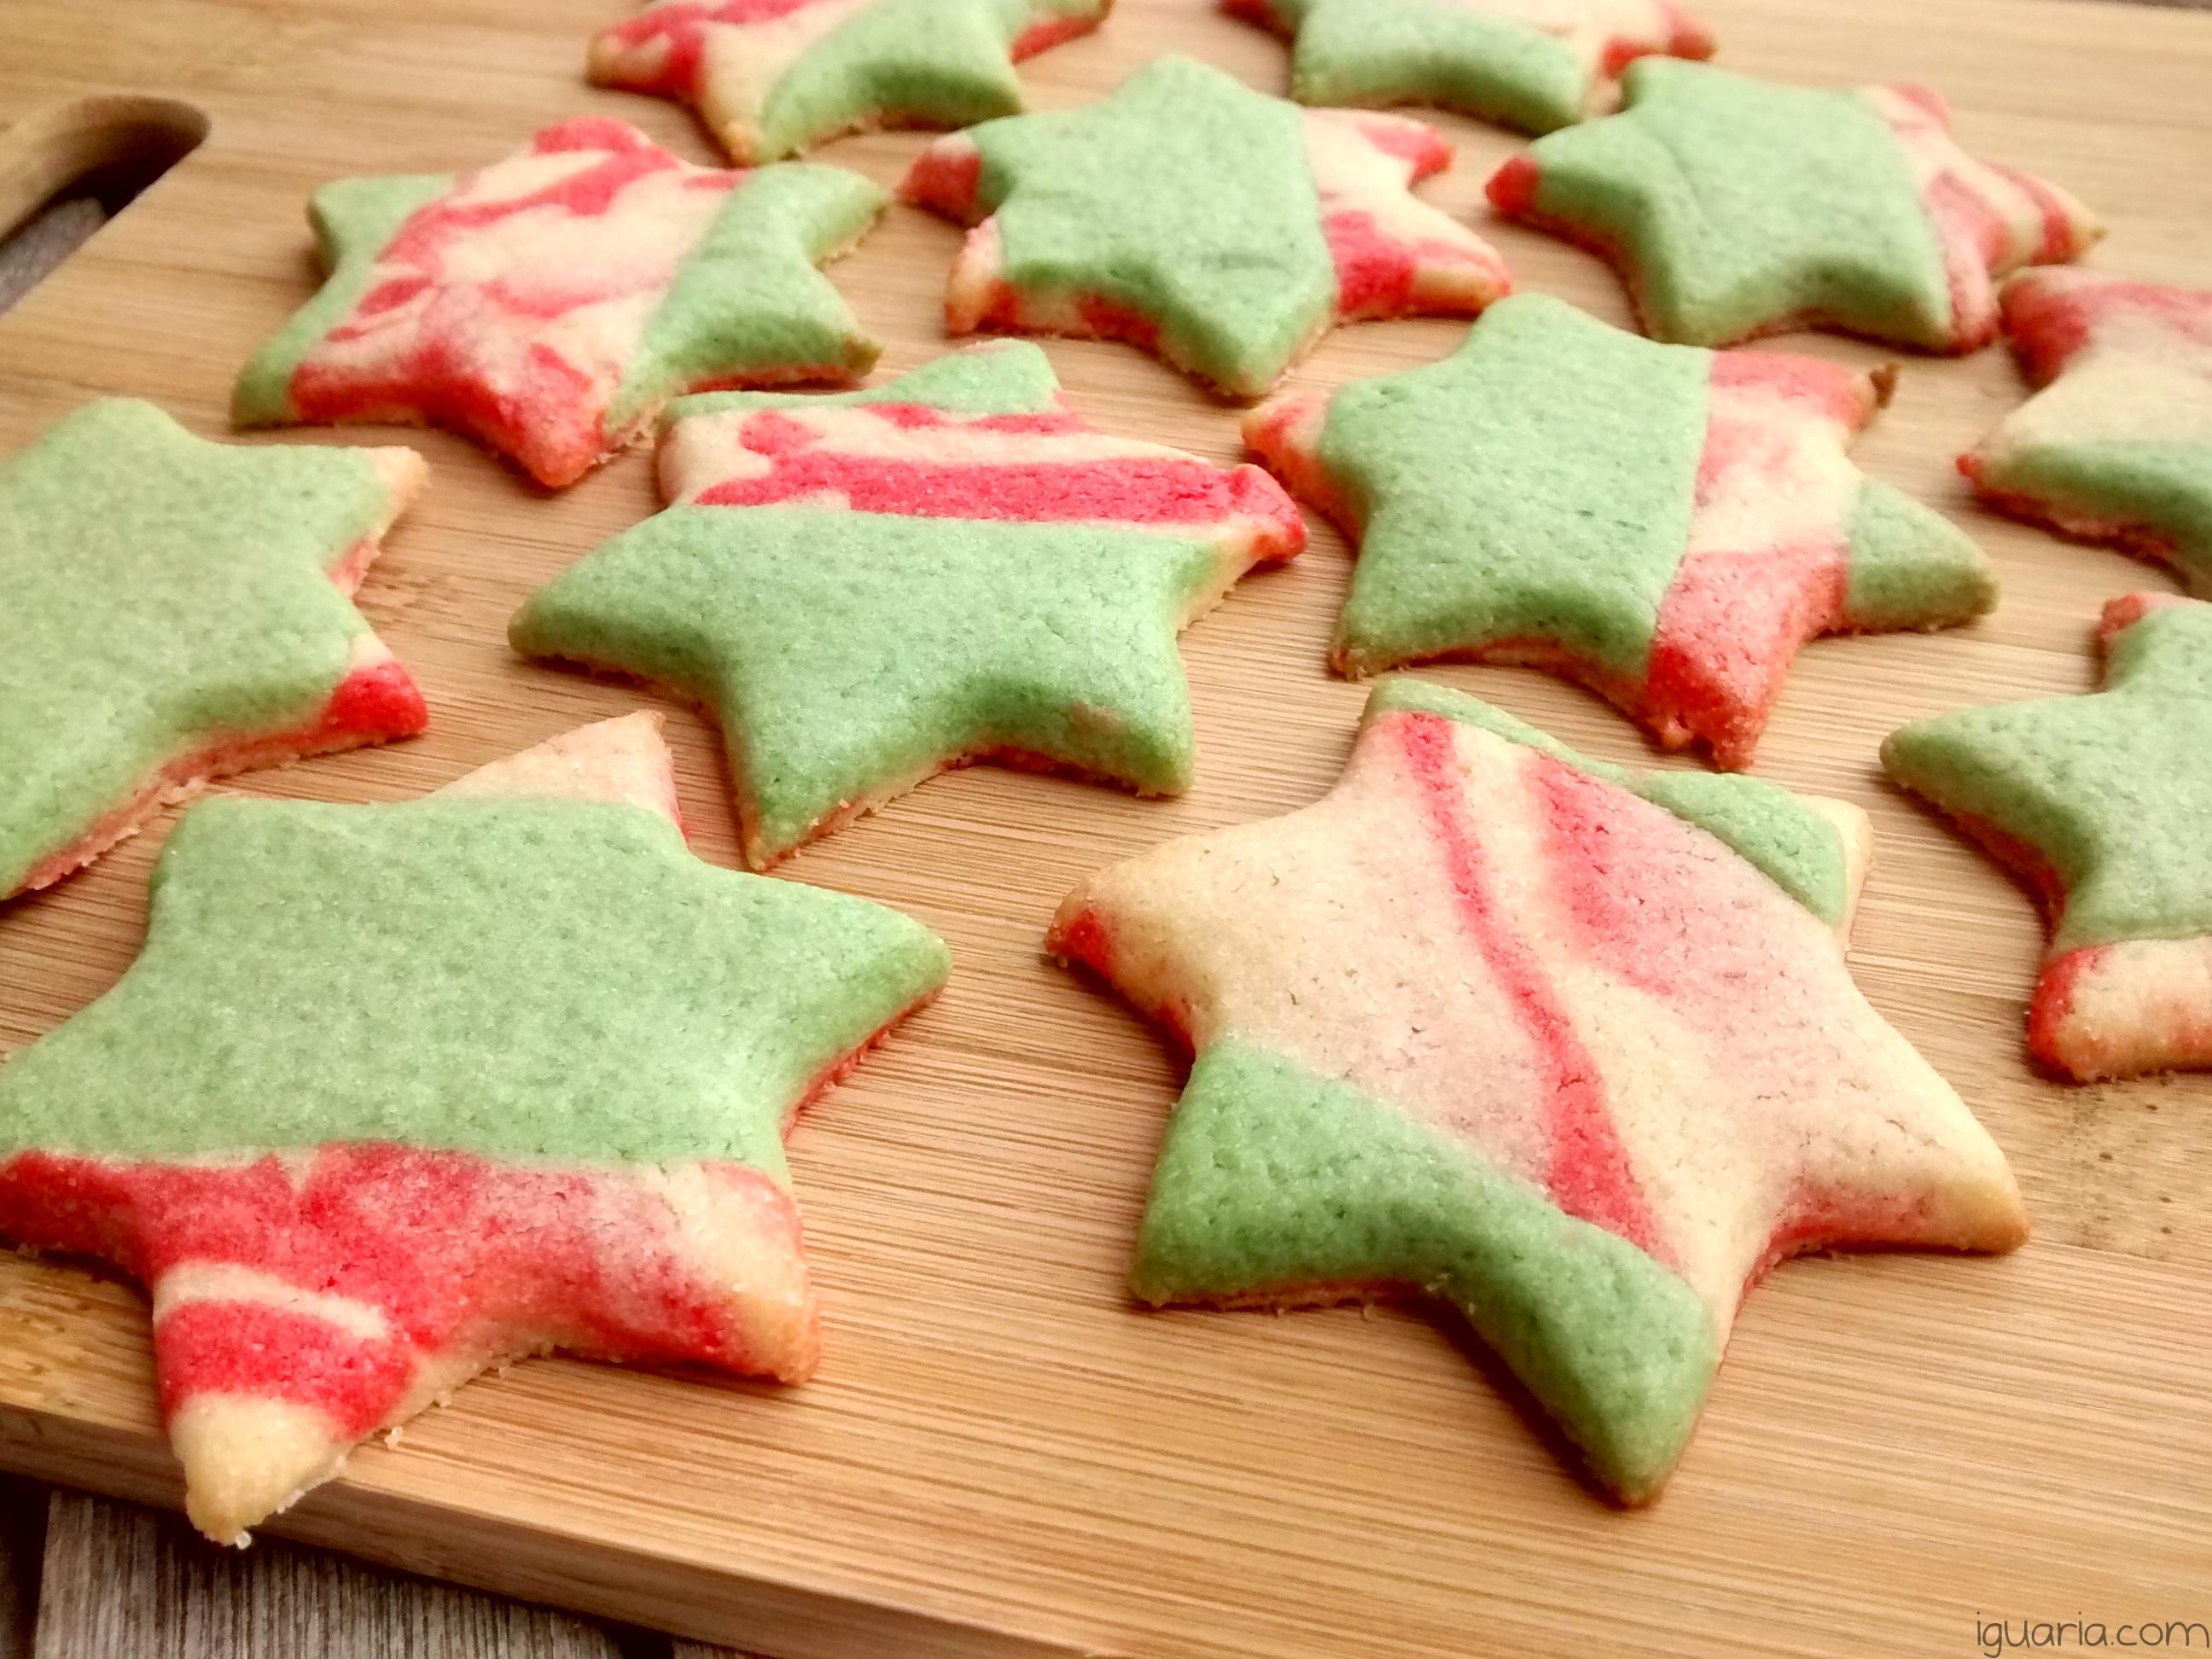 iguaria-biscoitos-estrela-natal-cozidos